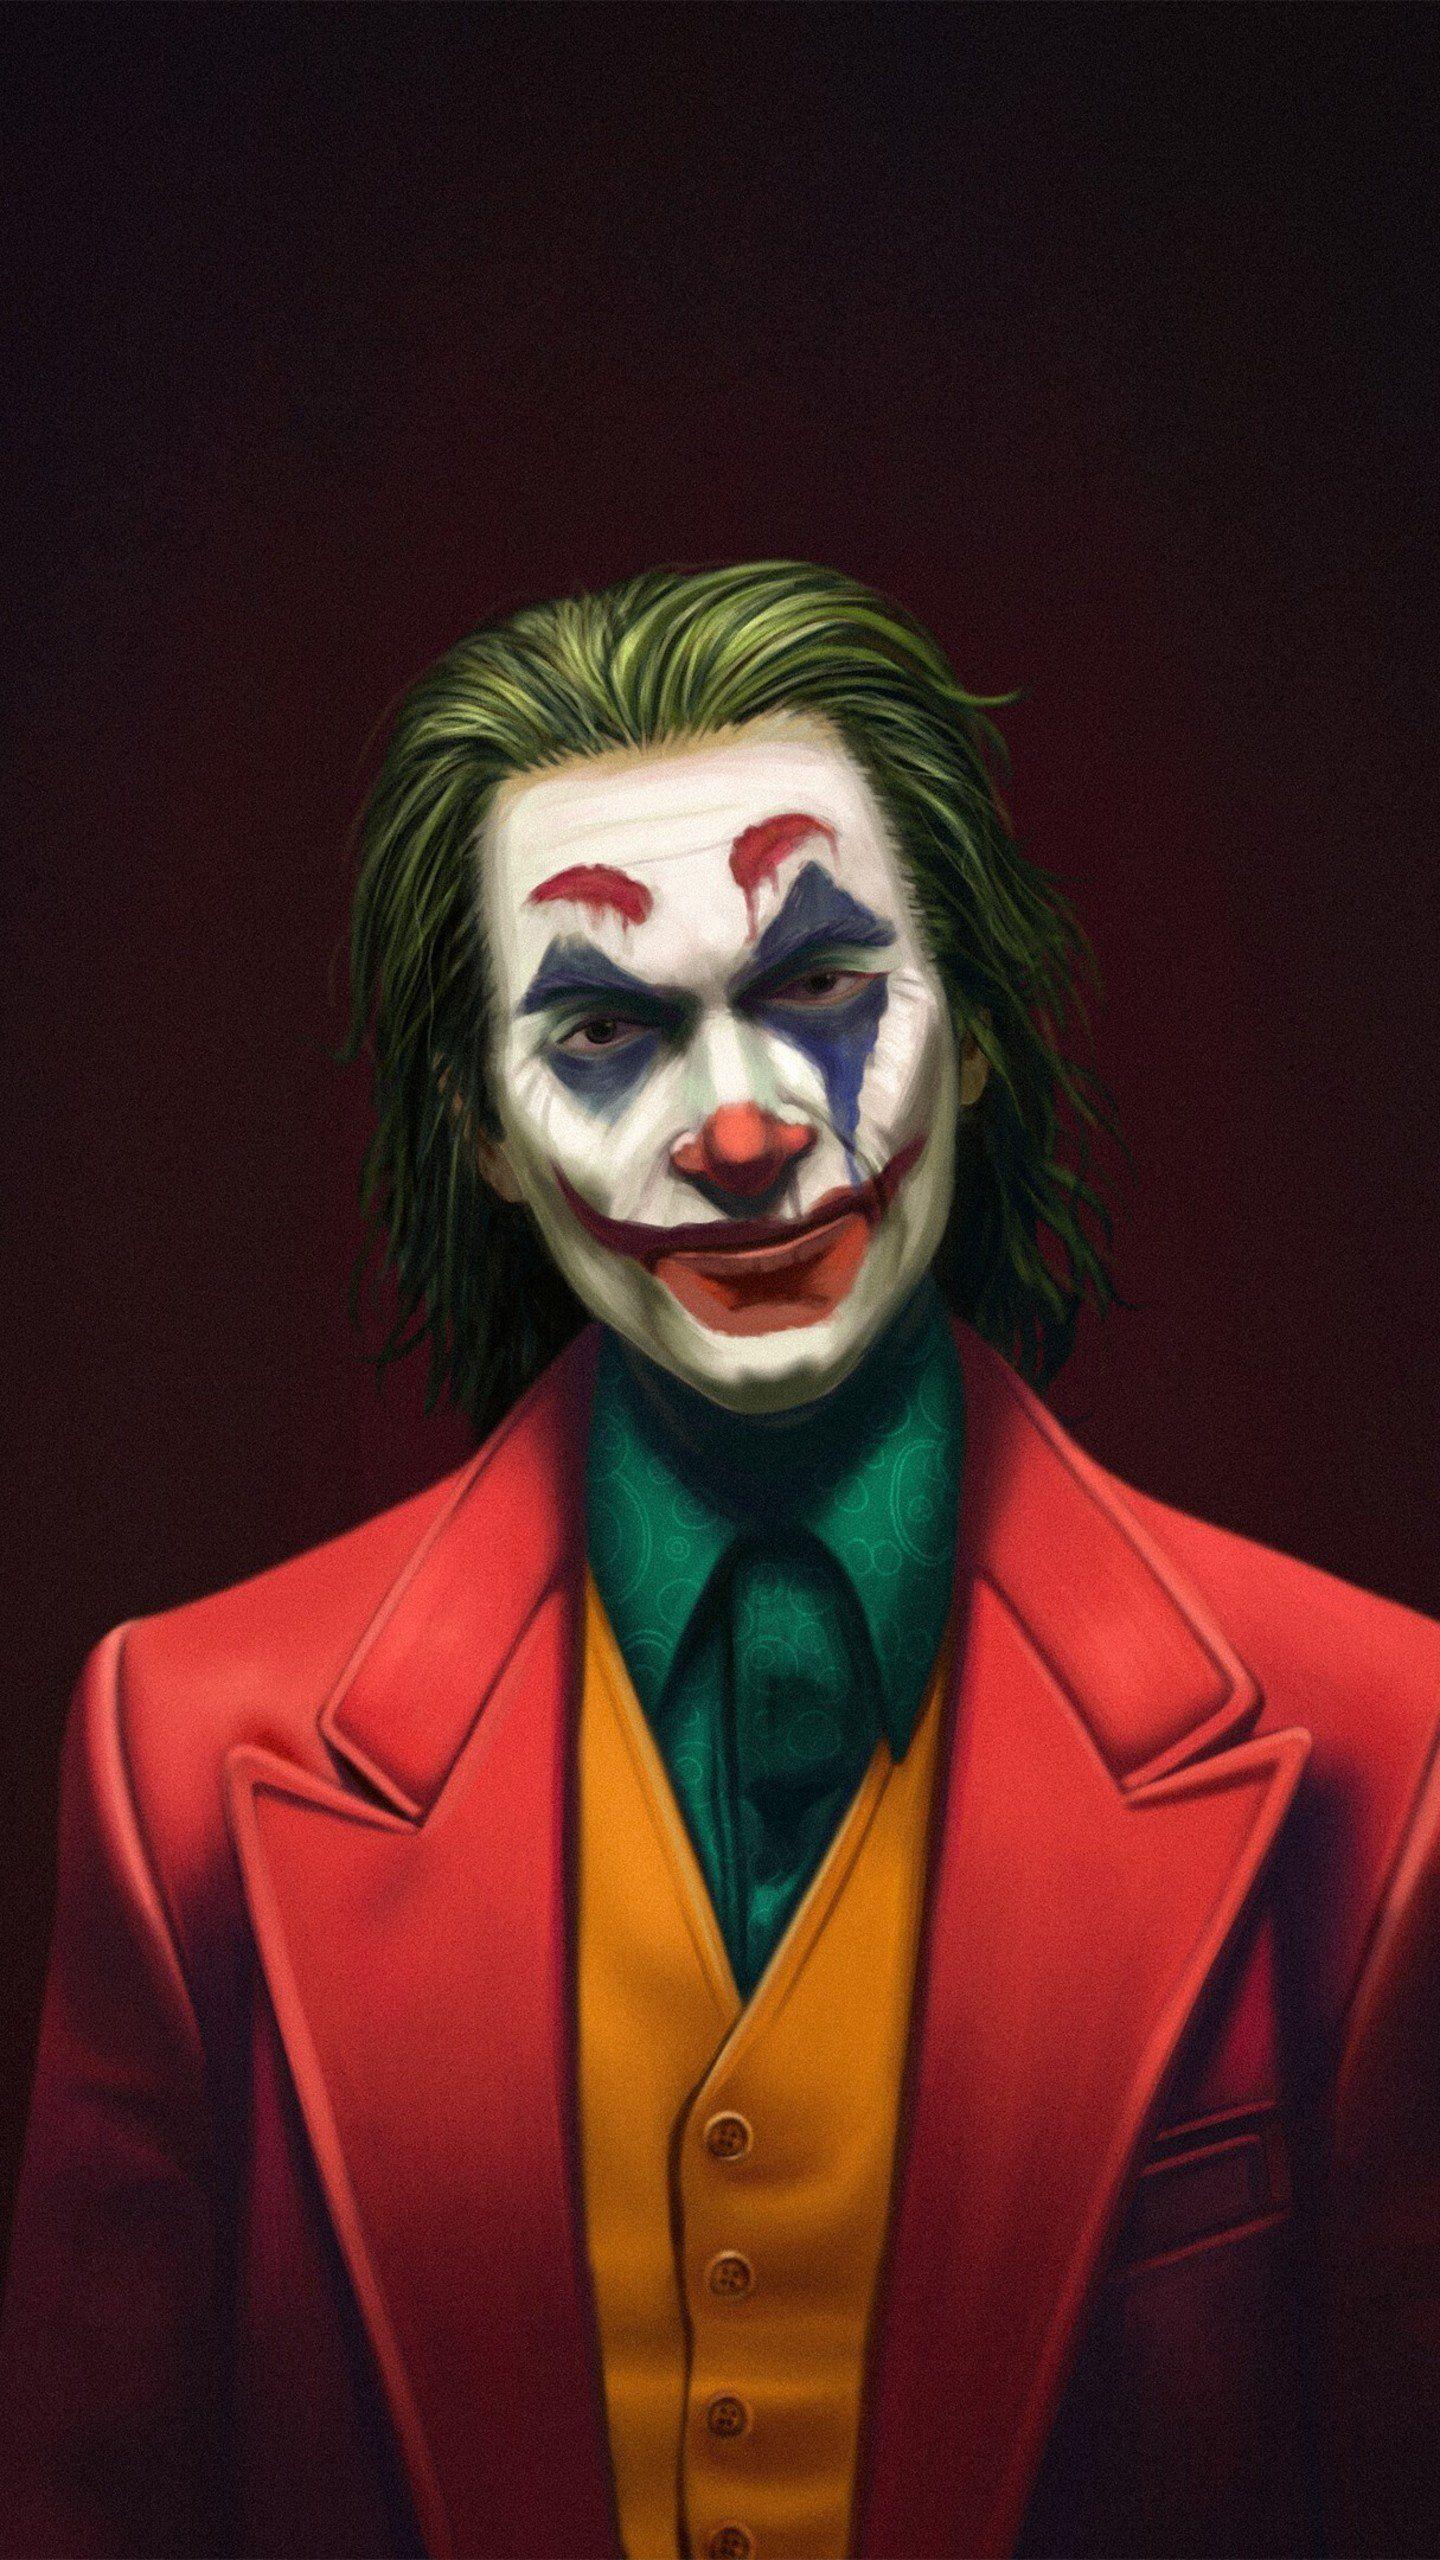 Joker Movie Joaquin Phoenix Art Hd Superheroes Wallpapers Photos And Pictures Id 44828 Joker Hd Wallpaper Joker Wallpapers Batman Joker Wallpaper